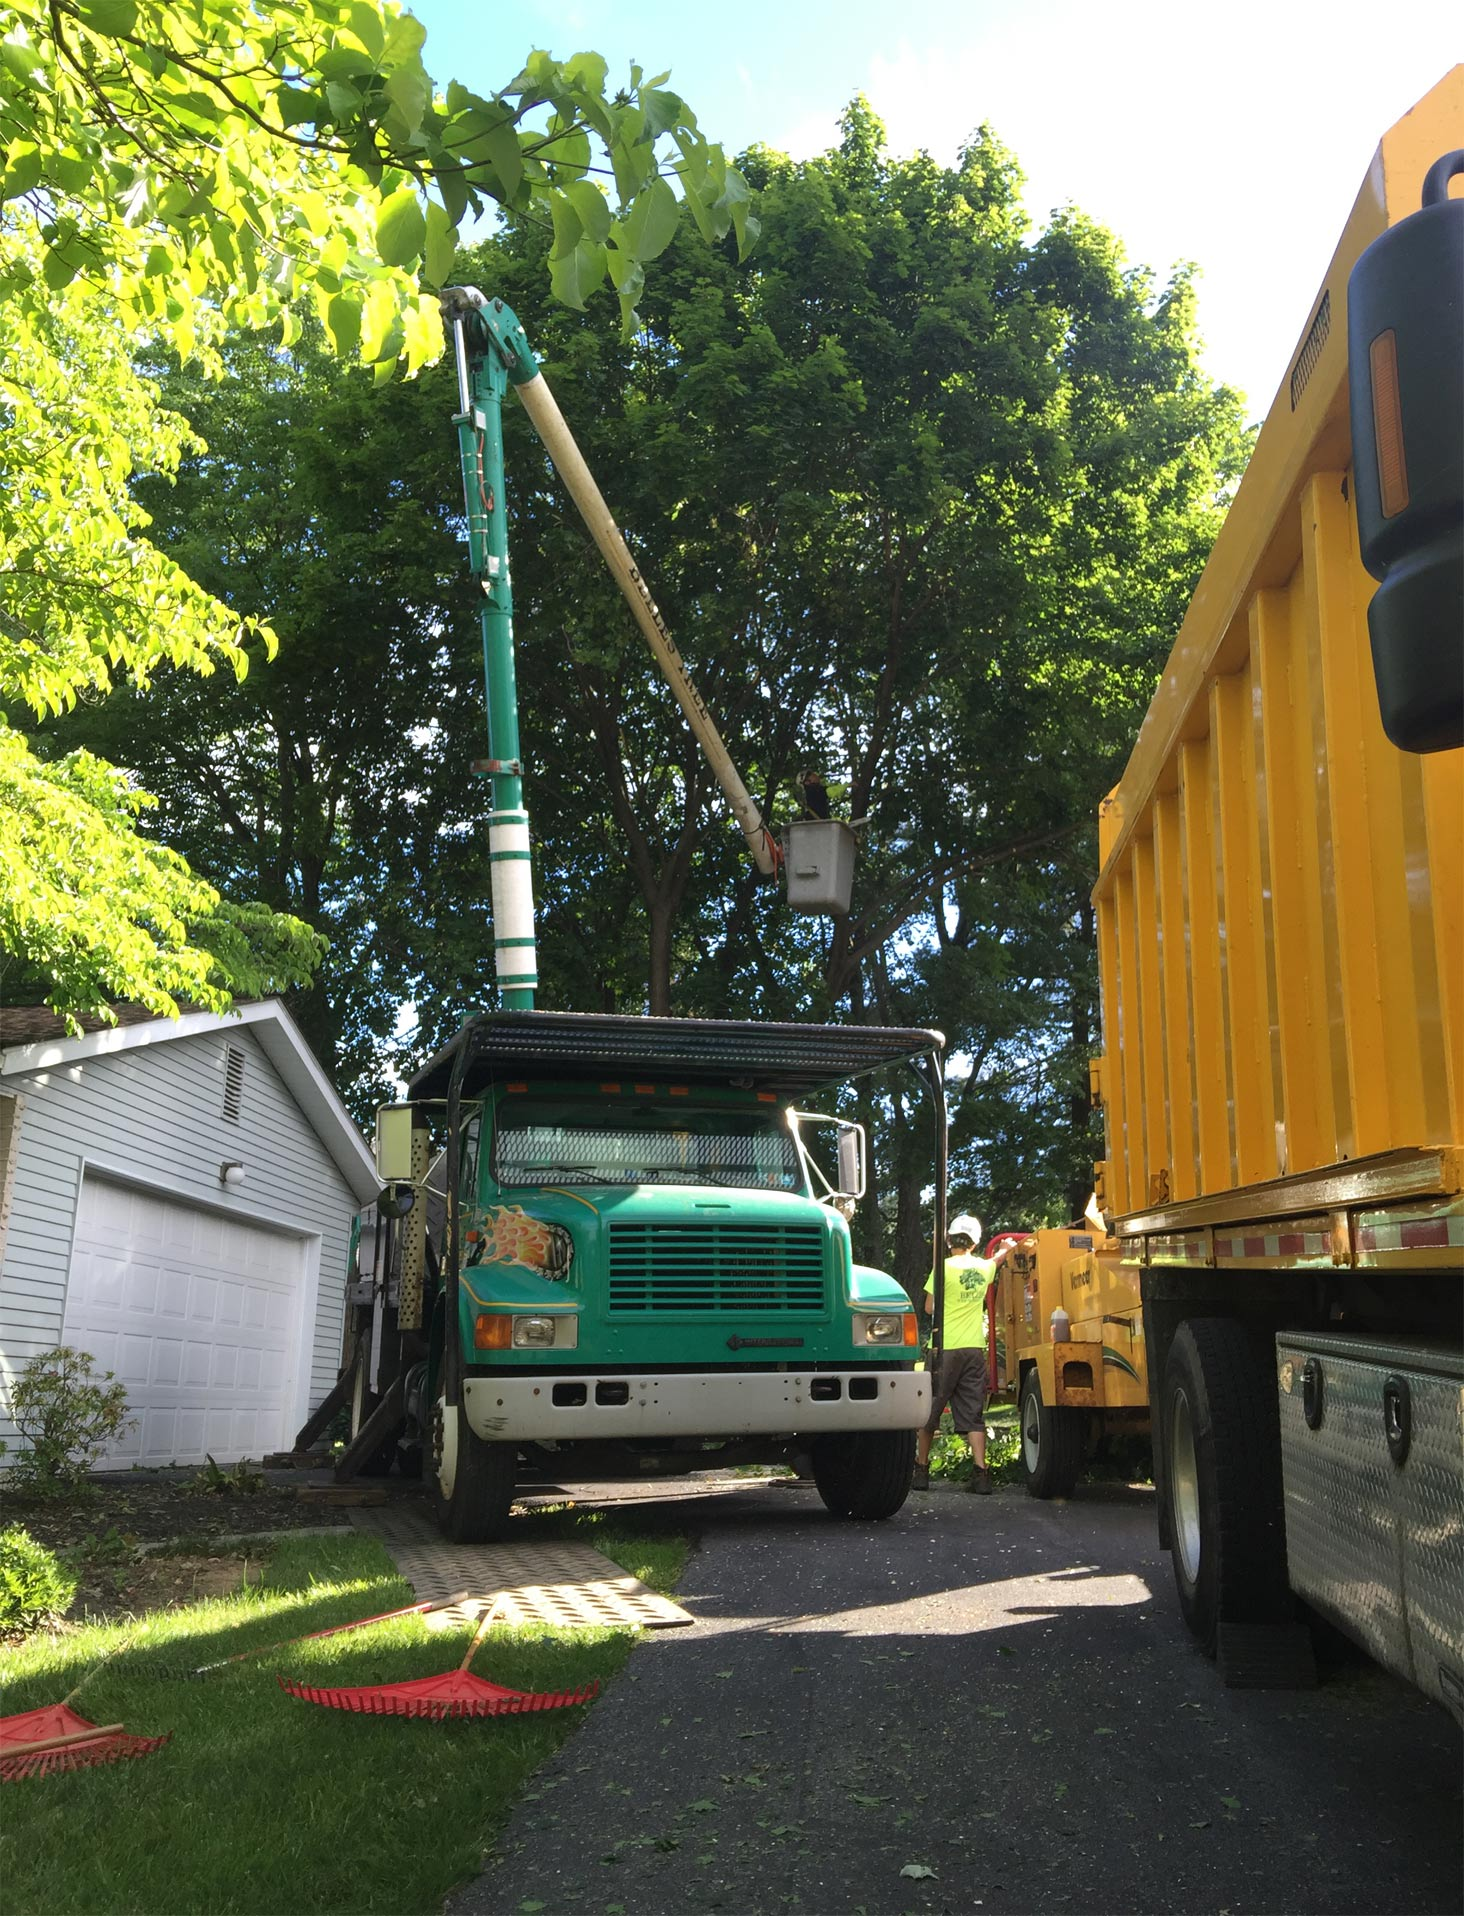 tree-removal-companies-easton-pa3